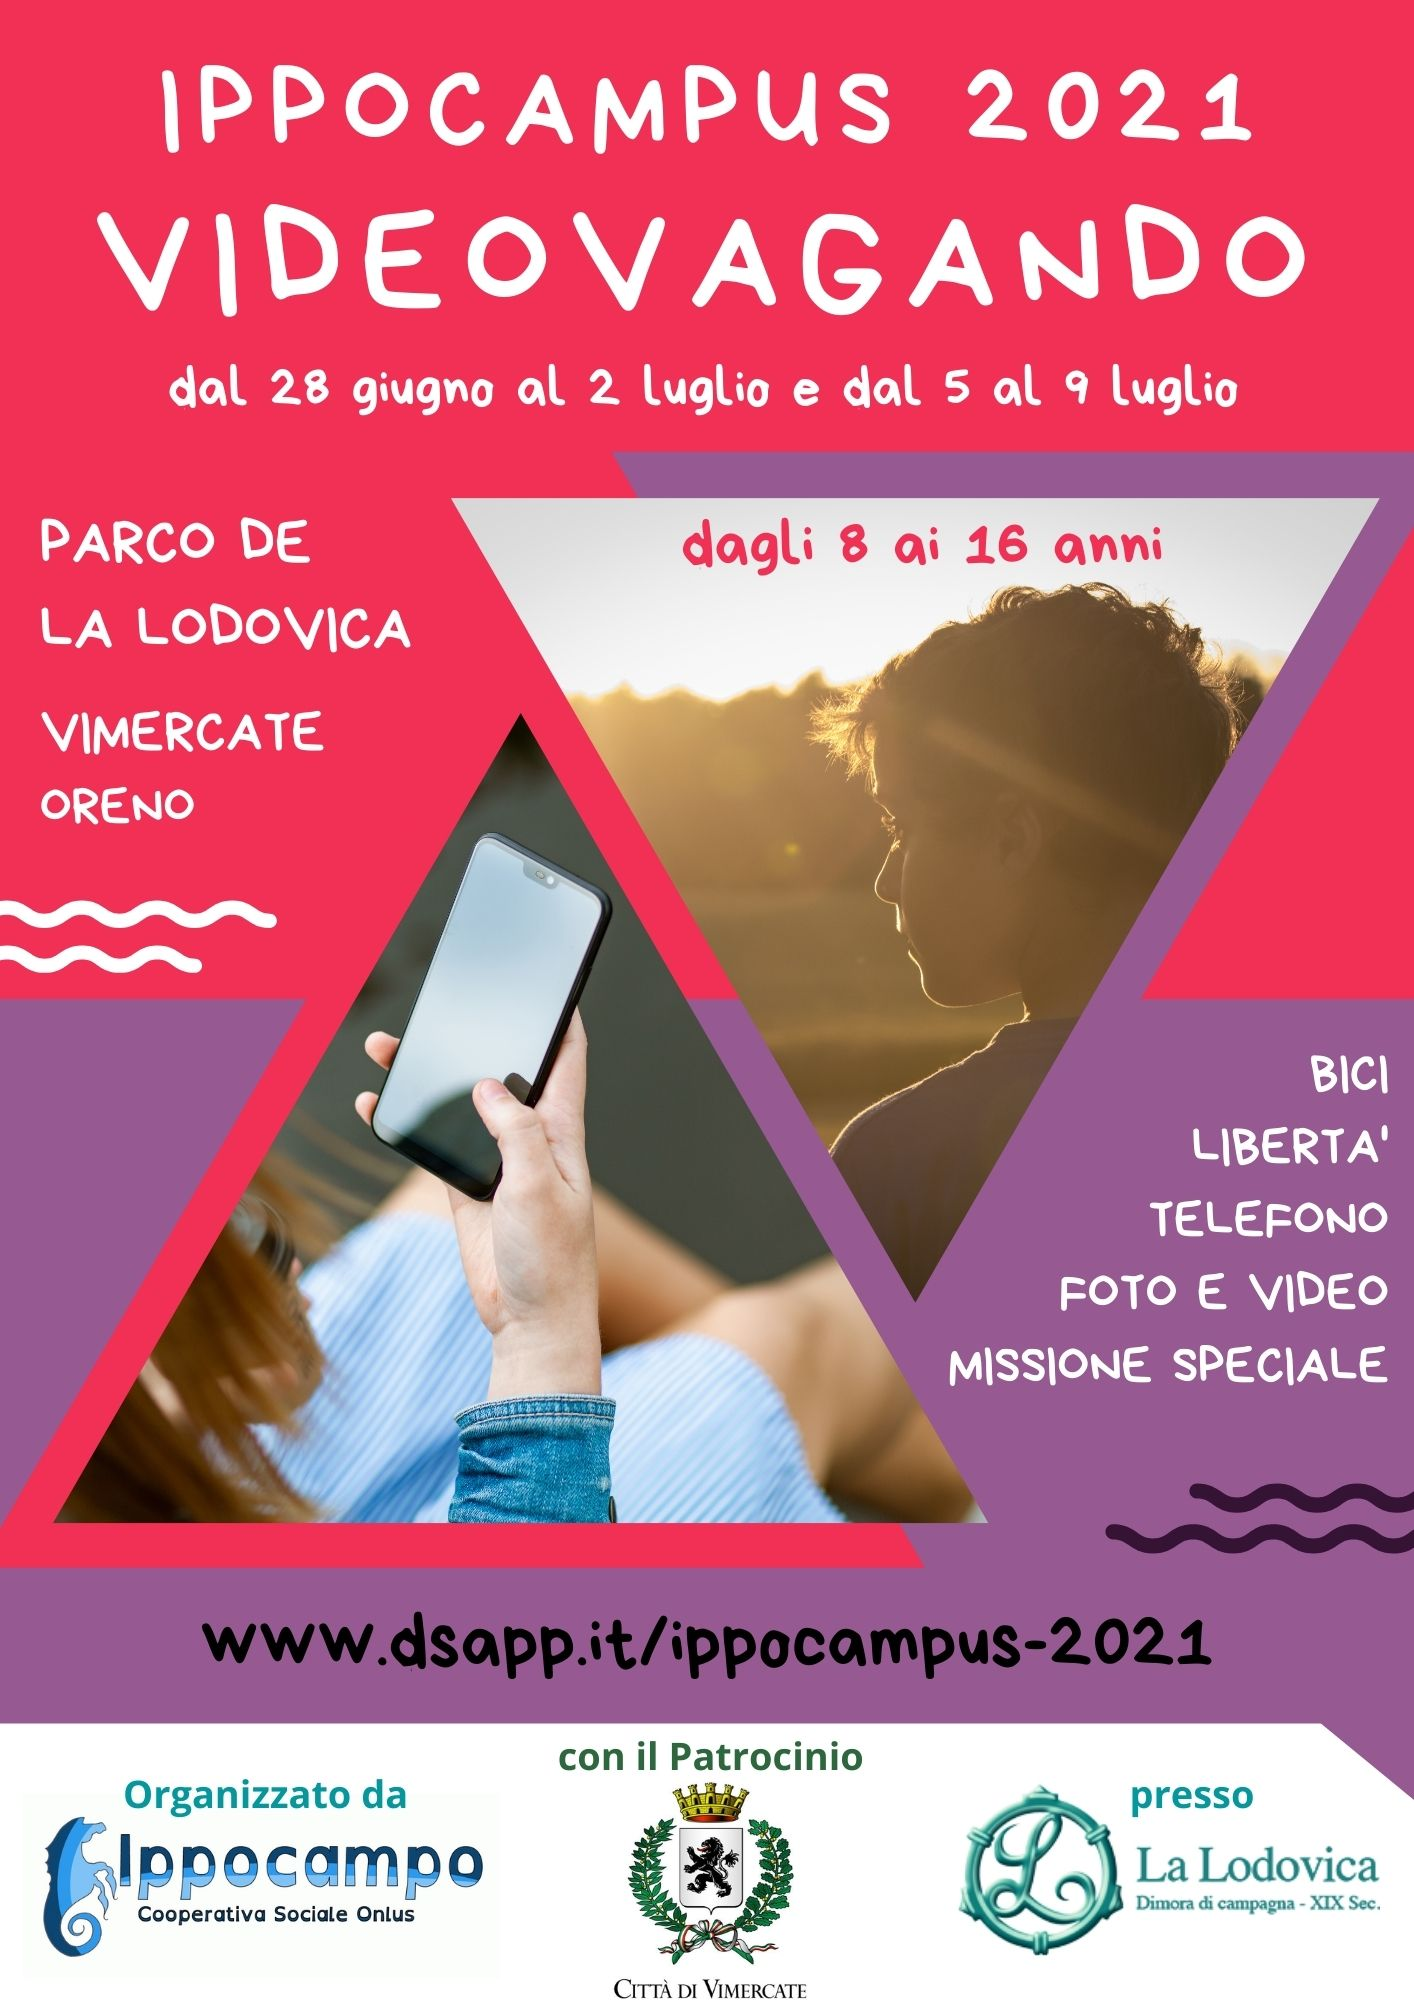 Ippocampus 2021